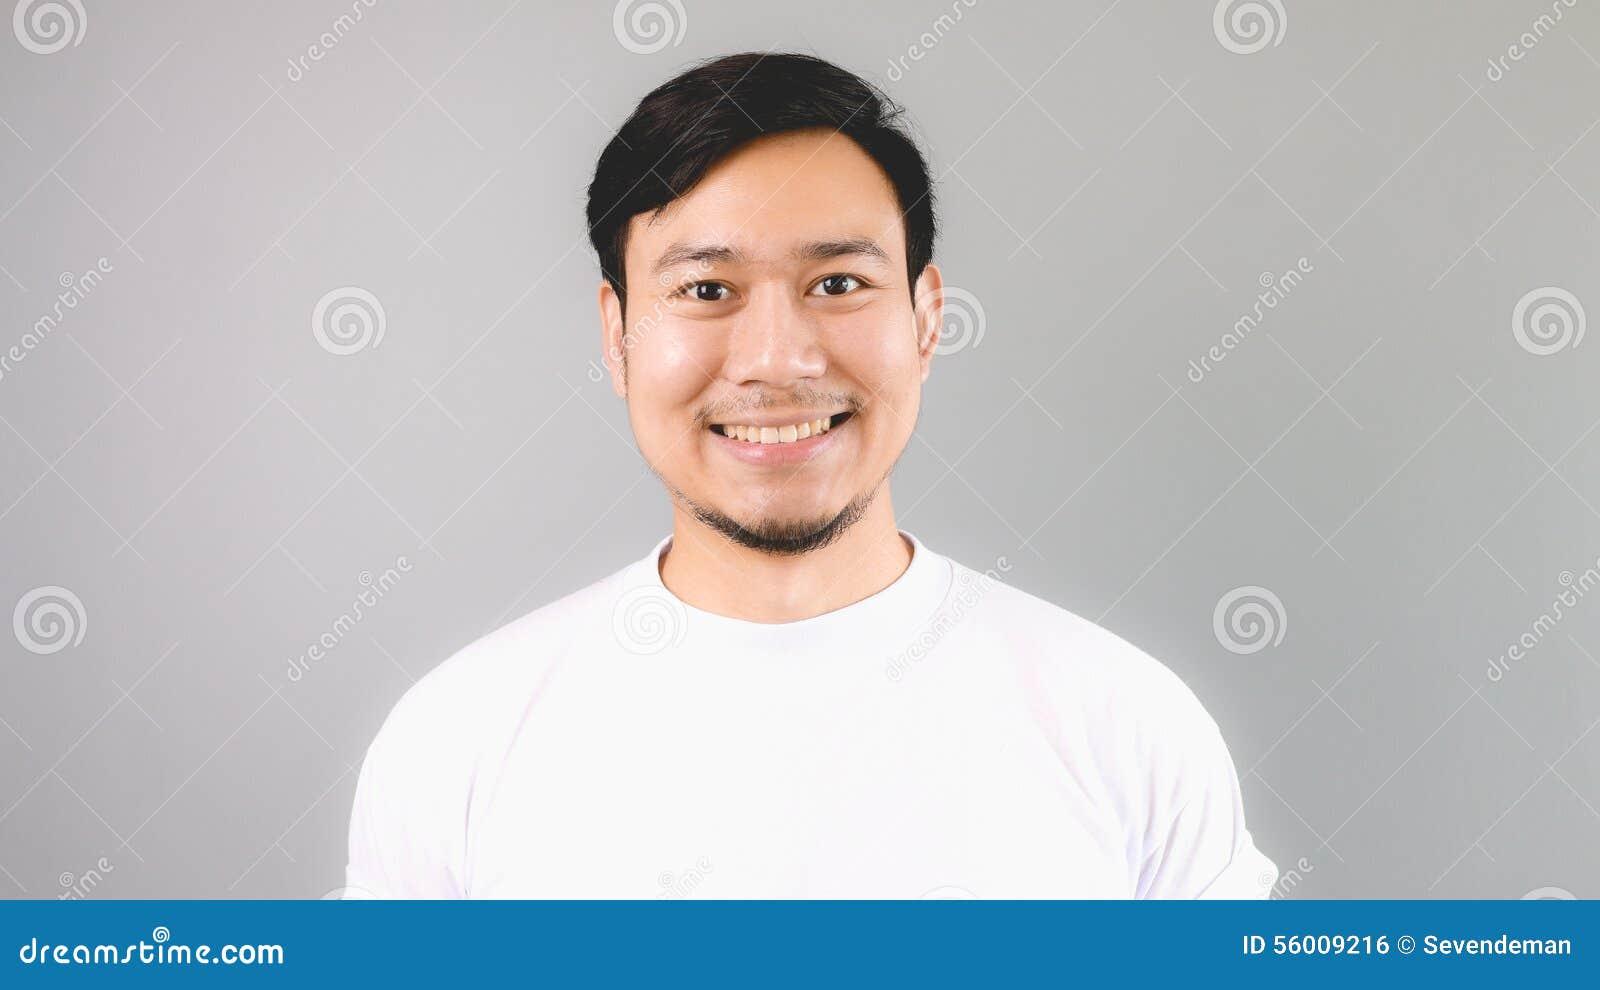 Straight happy face.